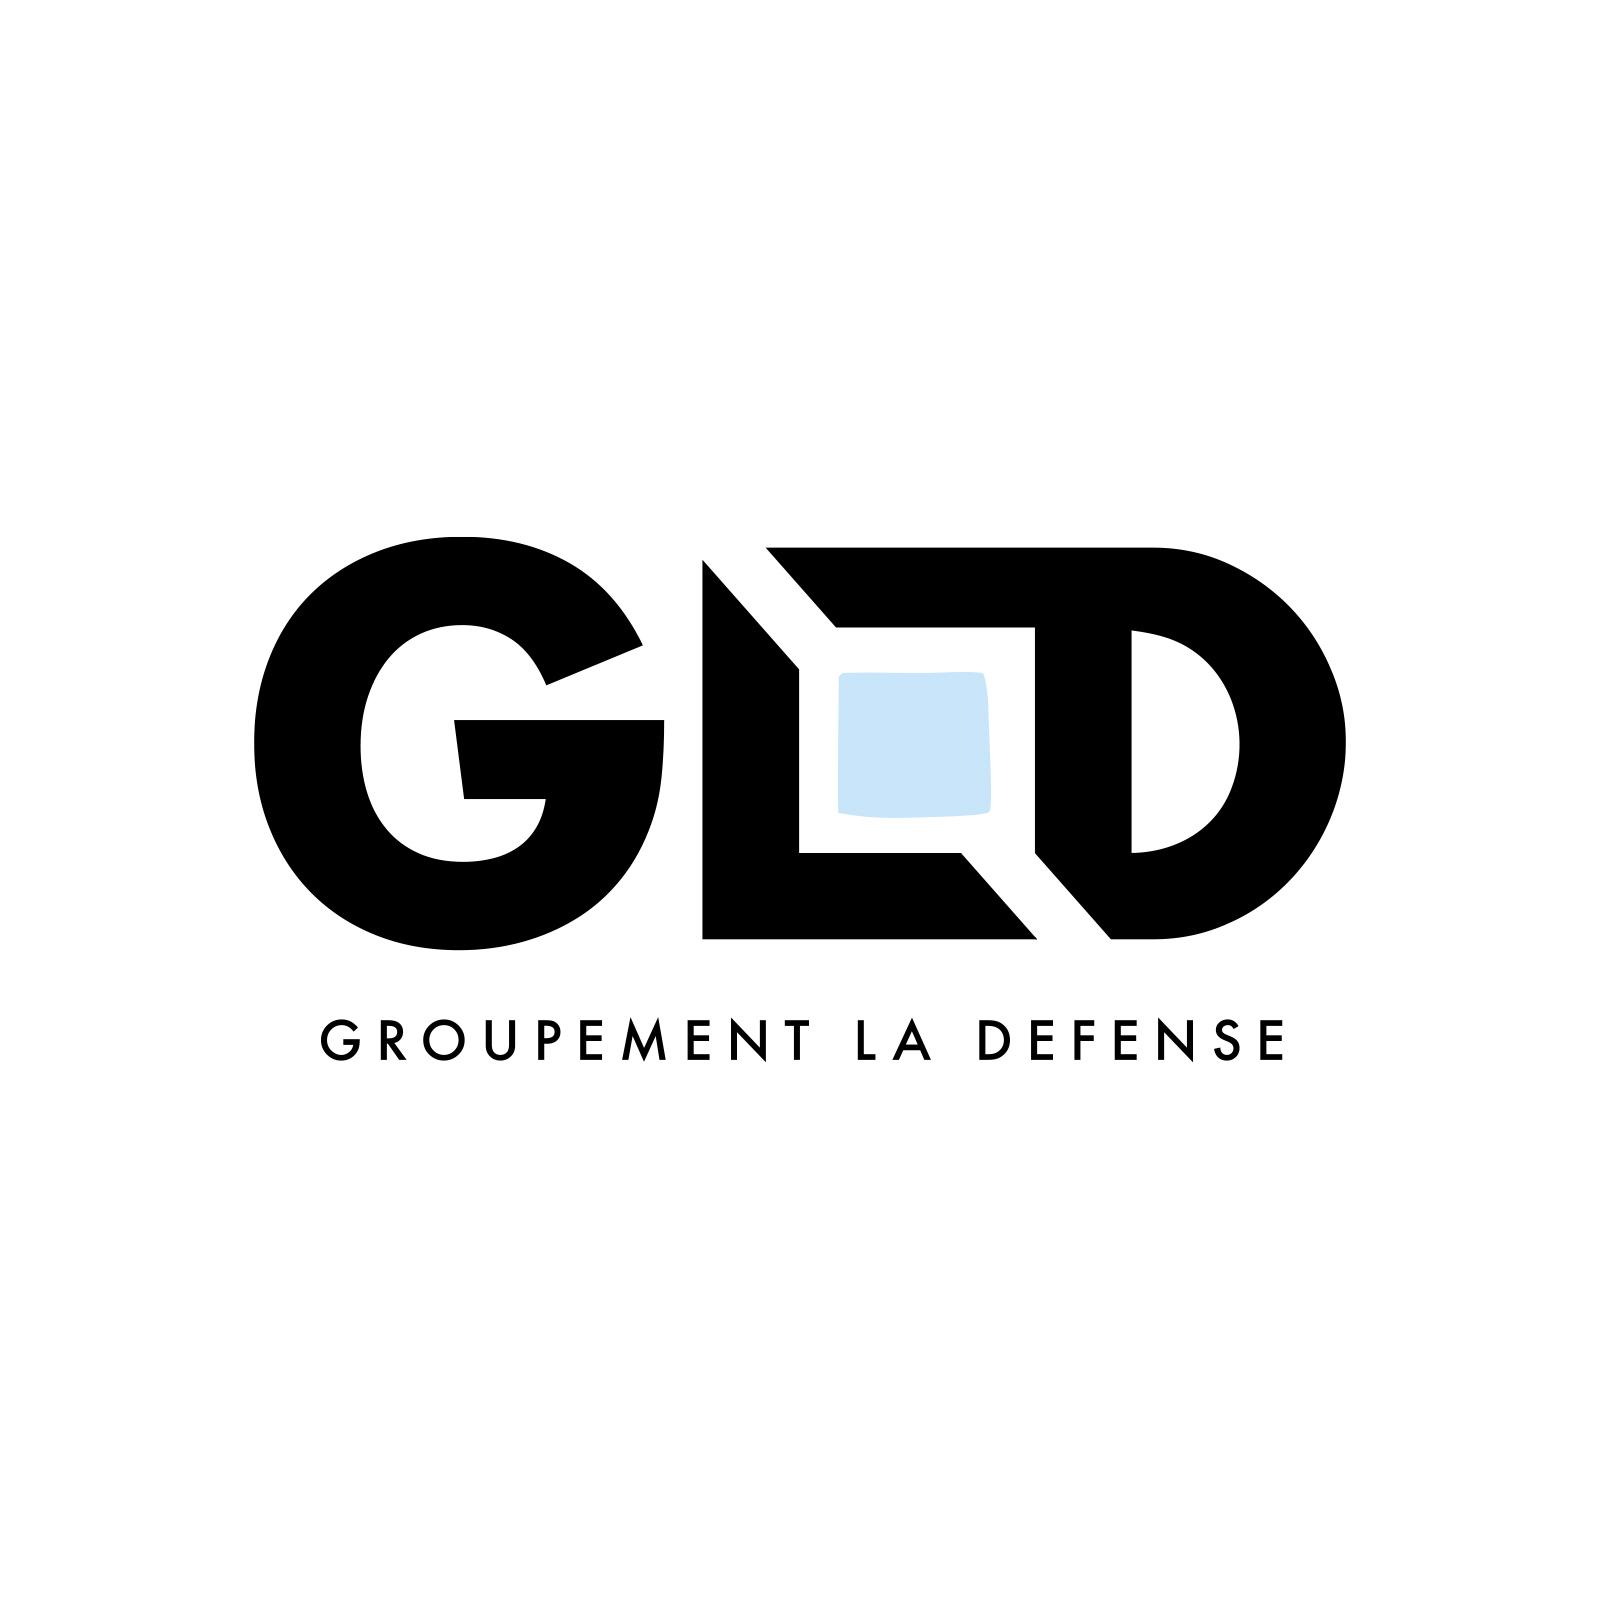 GLD_Logo_HR.jpg